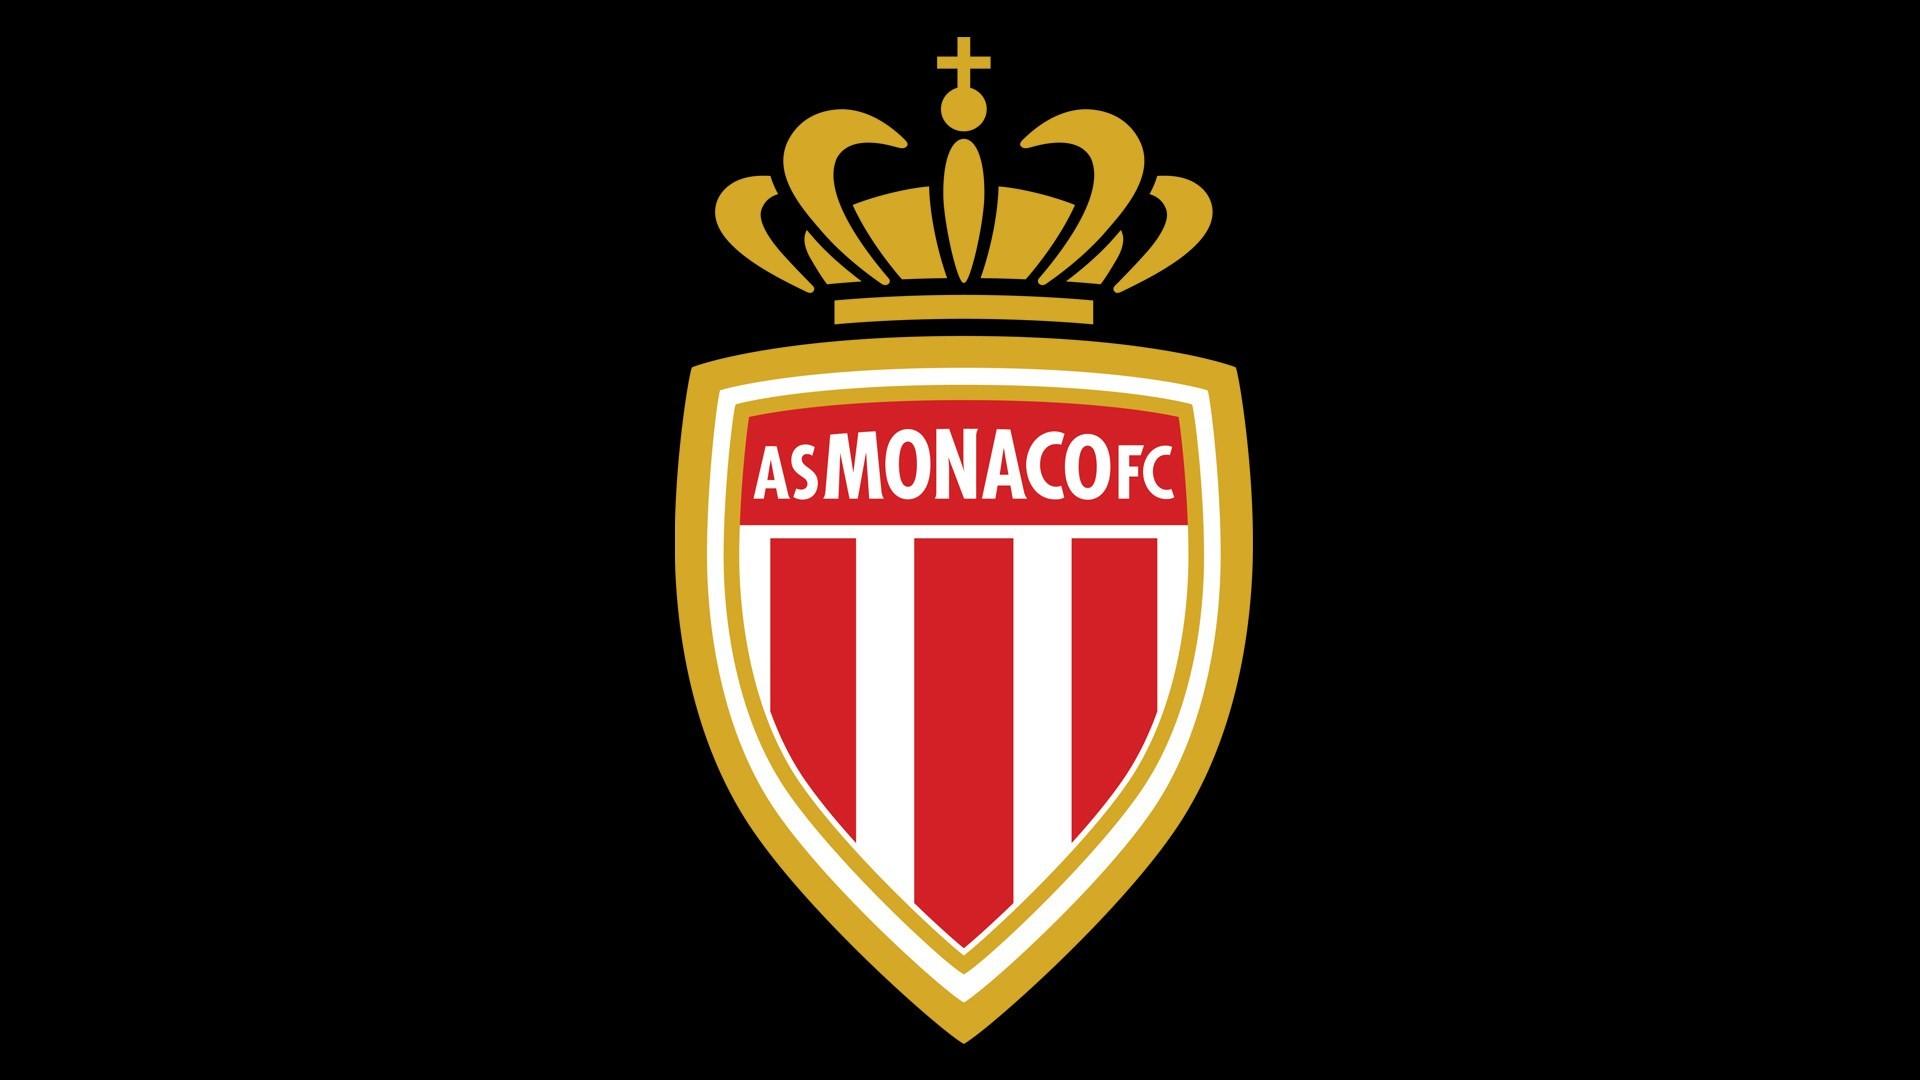 as monaco fc hd wallpaper   ololoshenka   Pinterest   Monaco, Hd wallpaper  and Wallpaper